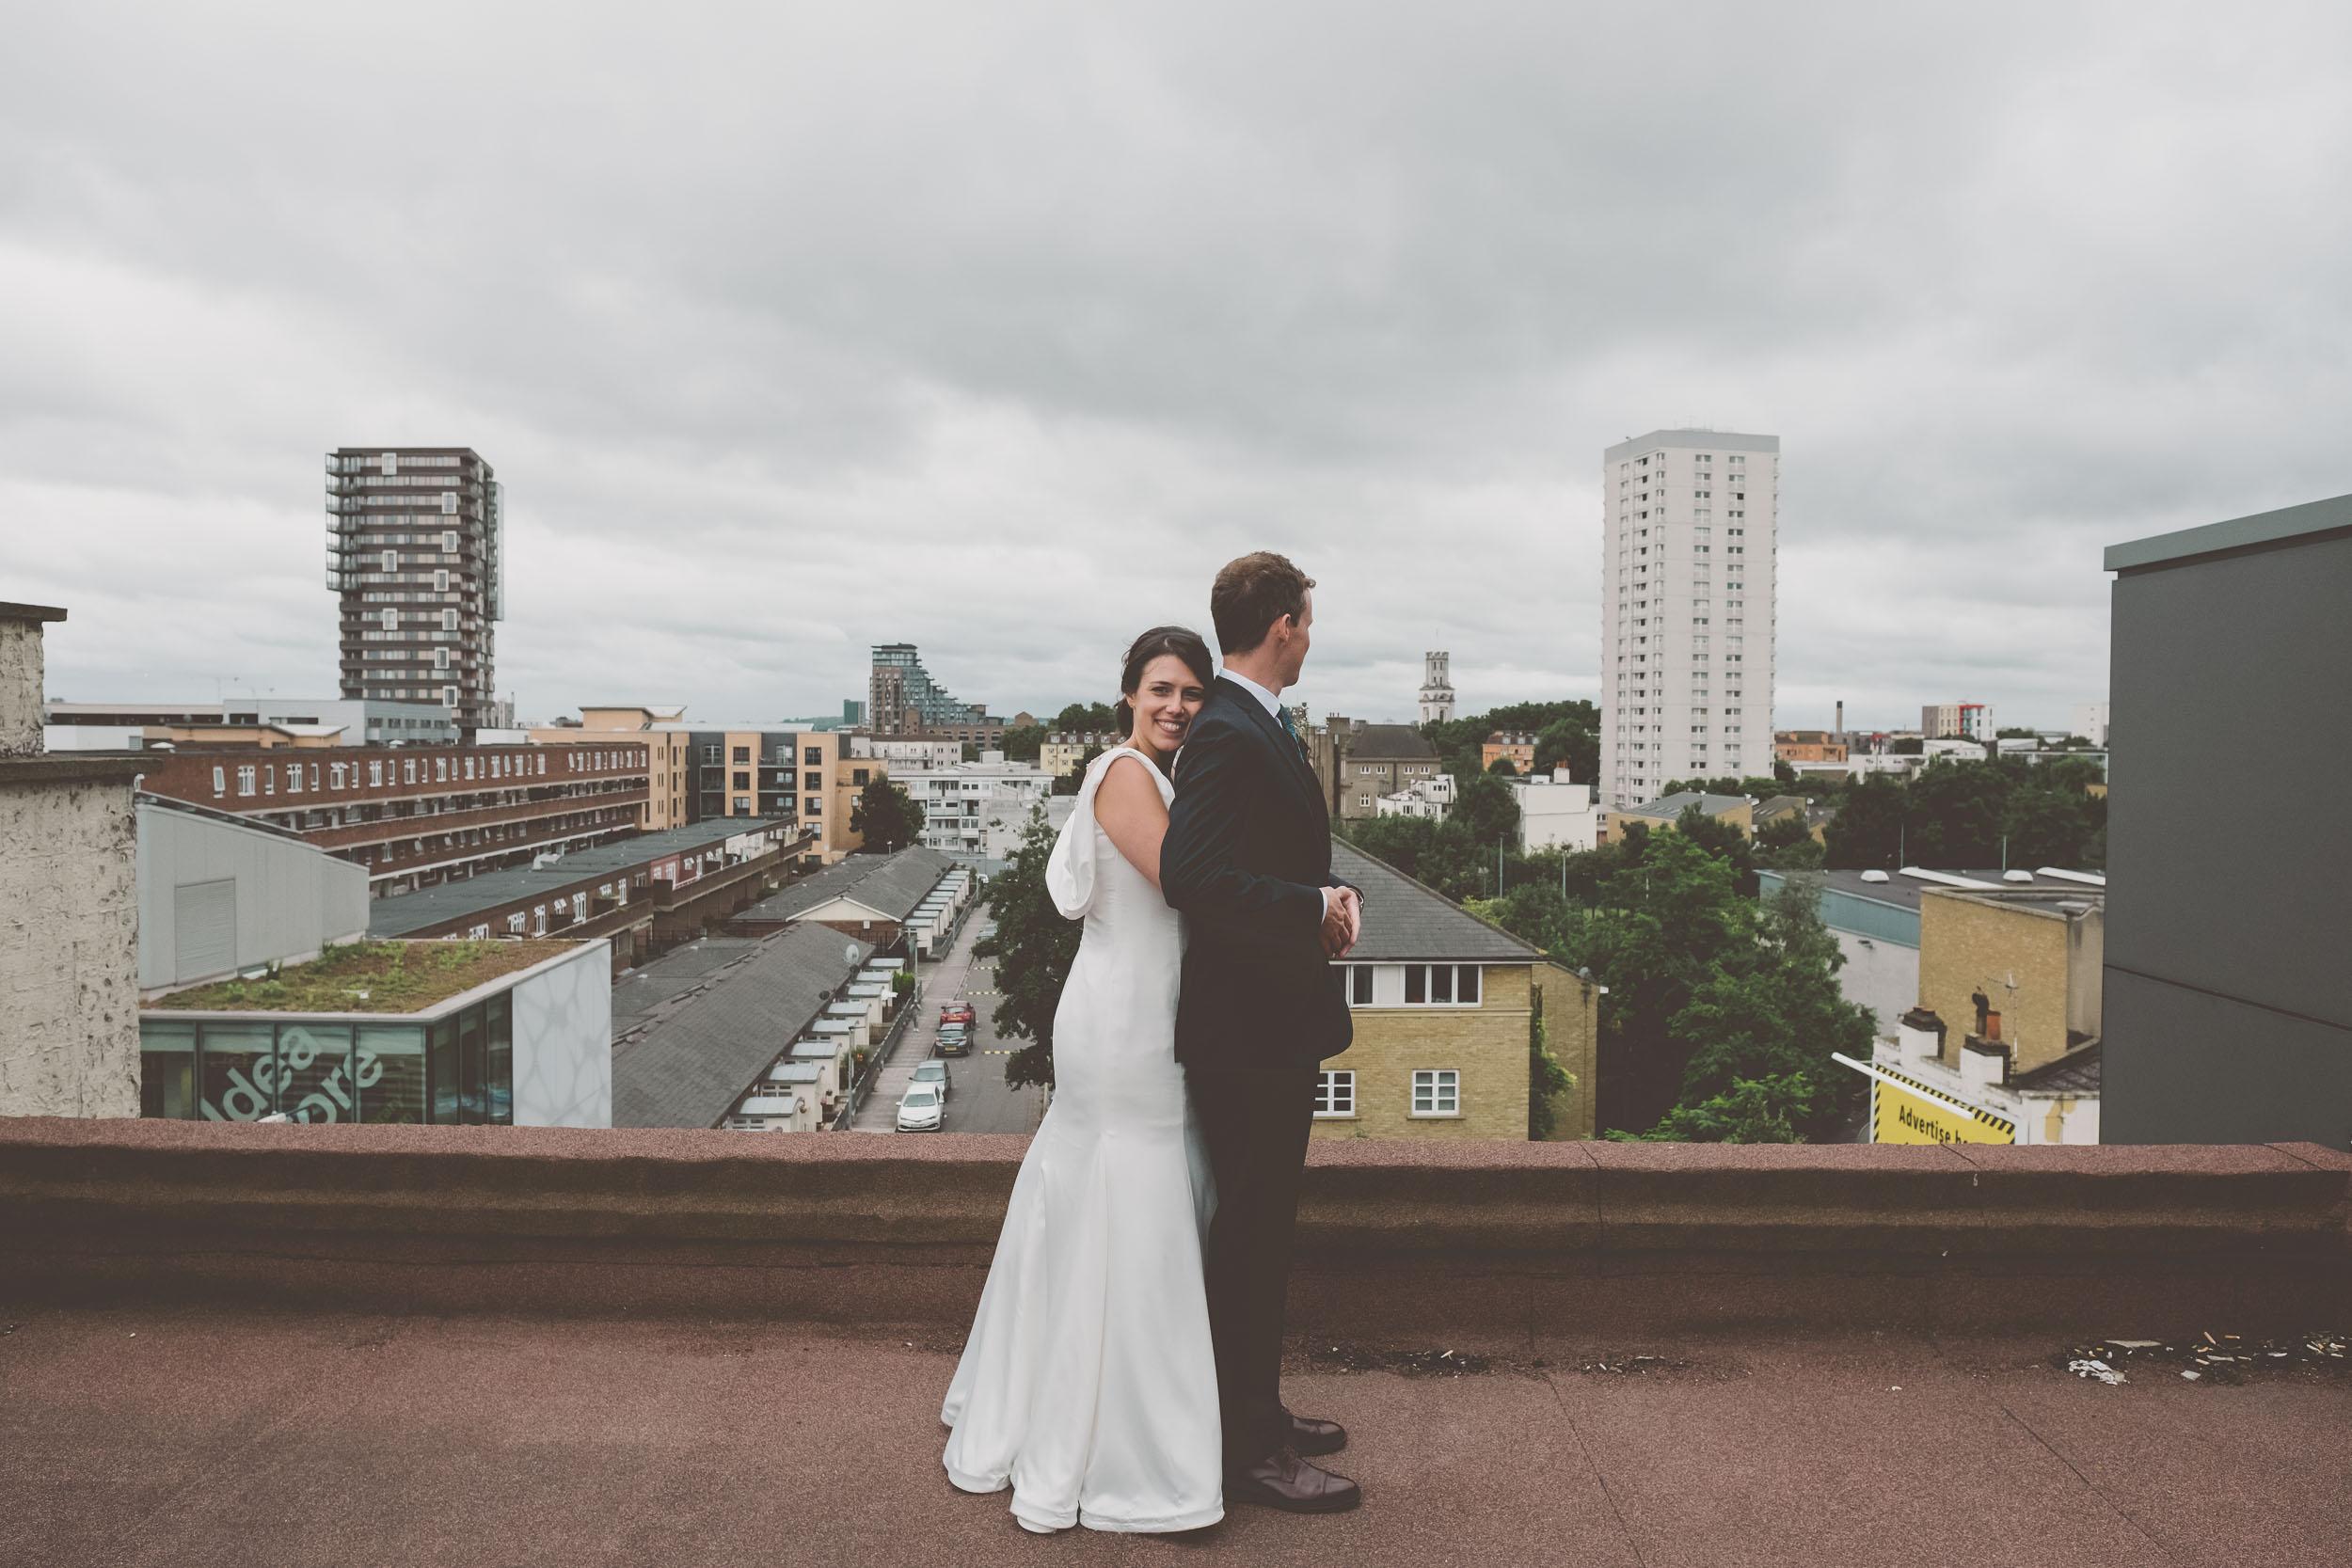 islington-town-hall-4th-floor-studios-wedding286.jpg